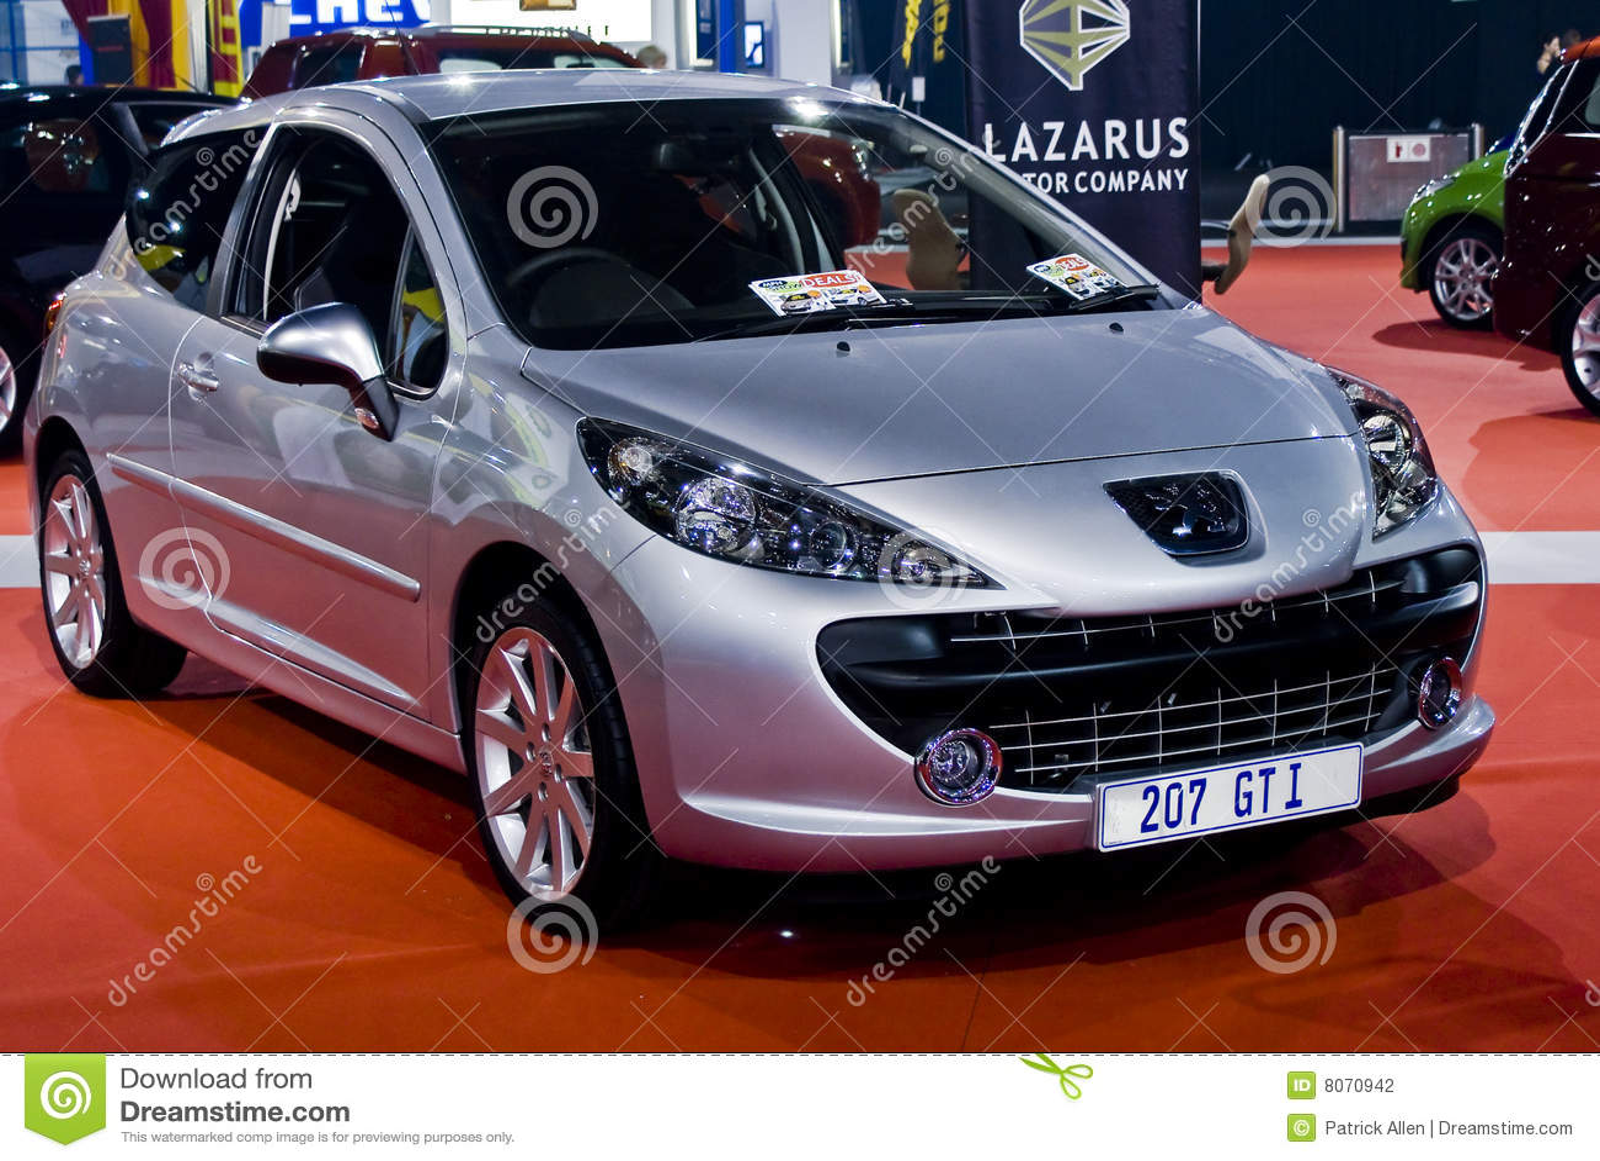 Peugeot 207 Gti - Portilla De 5 Puertas